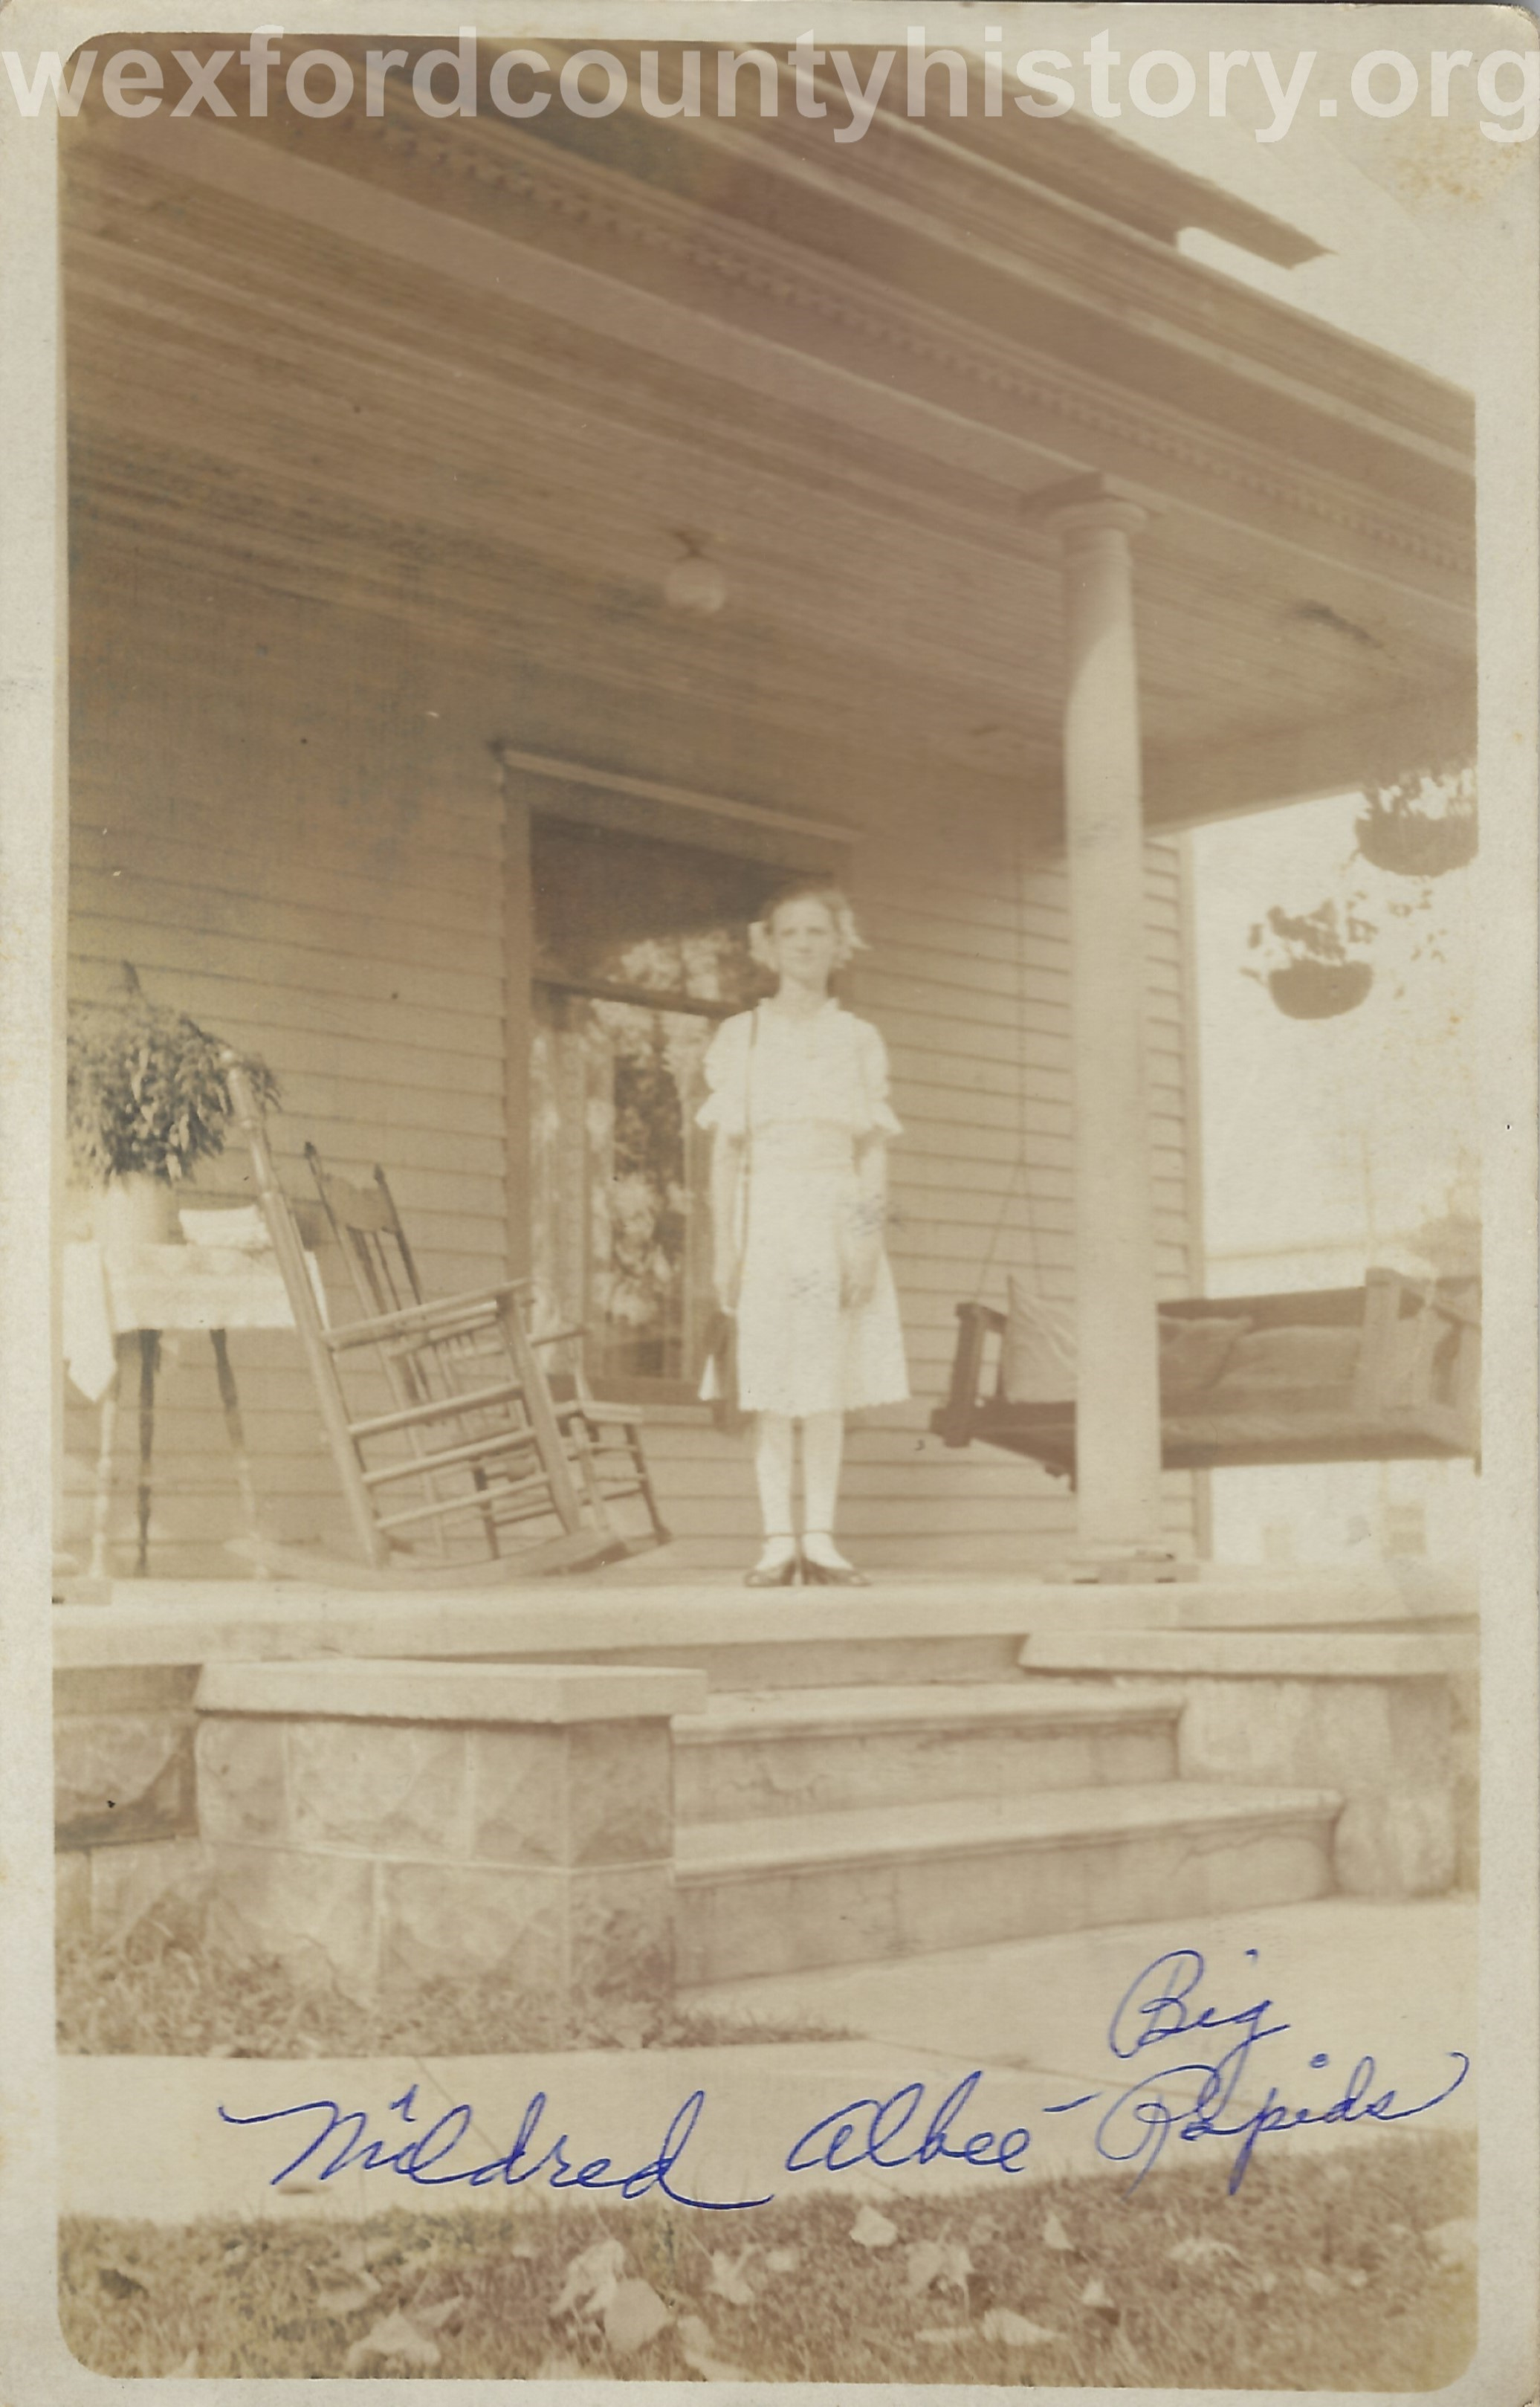 Mildred Albee